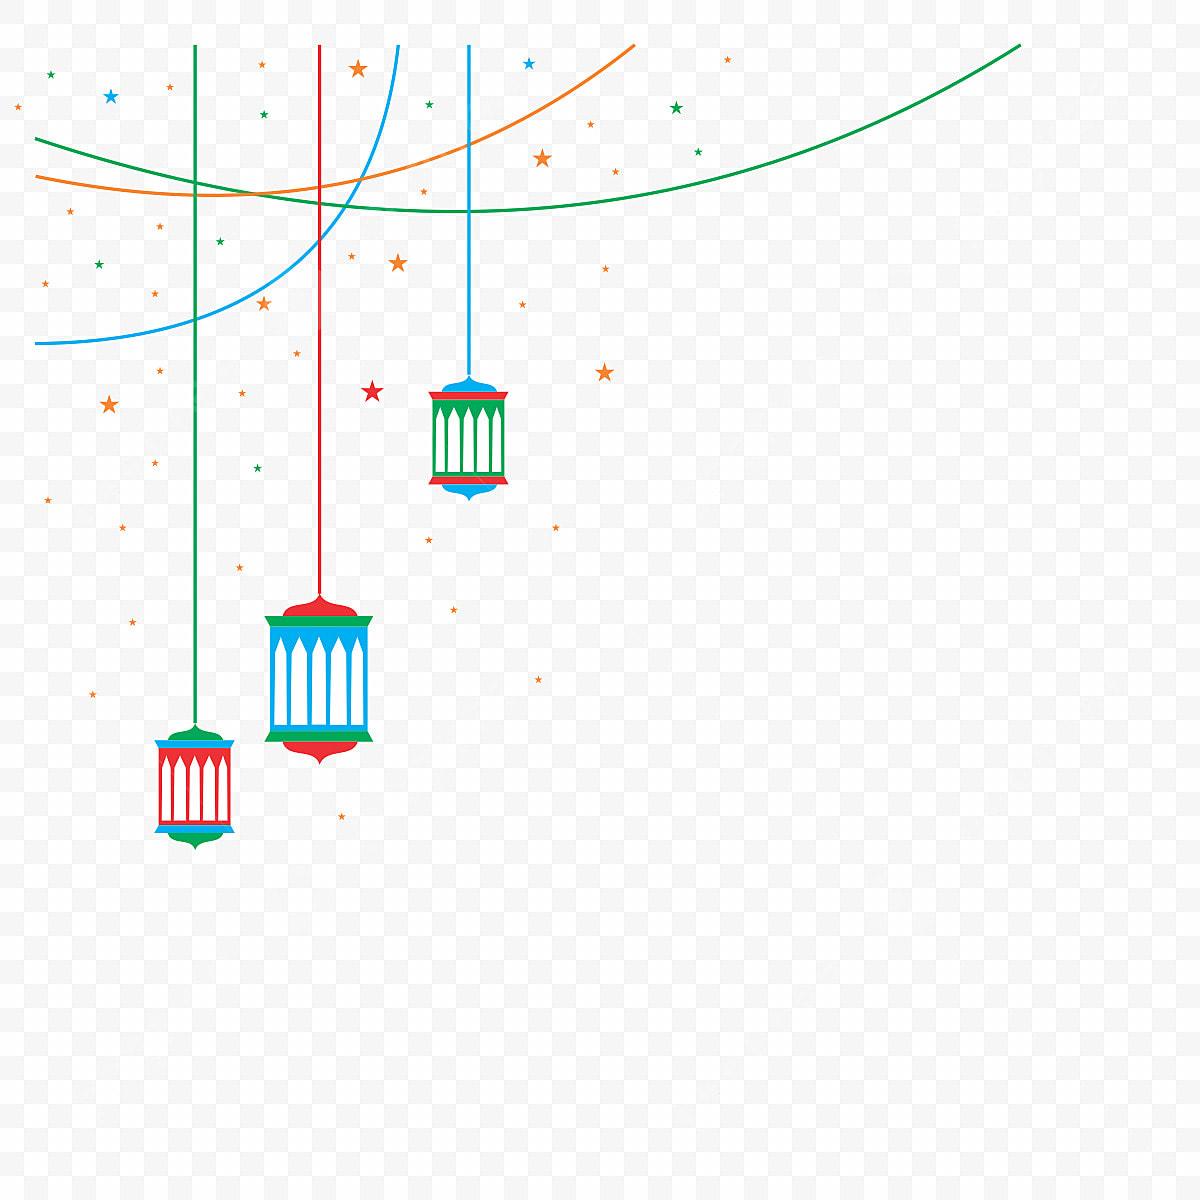 chandelier lamp hanging border eid al adha png free download png lamp kareemramdan backfround islamic background png transparent image and clipart for free download https pngtree com freepng chandelier lamp hanging border eid al adha png free download 3591369 html